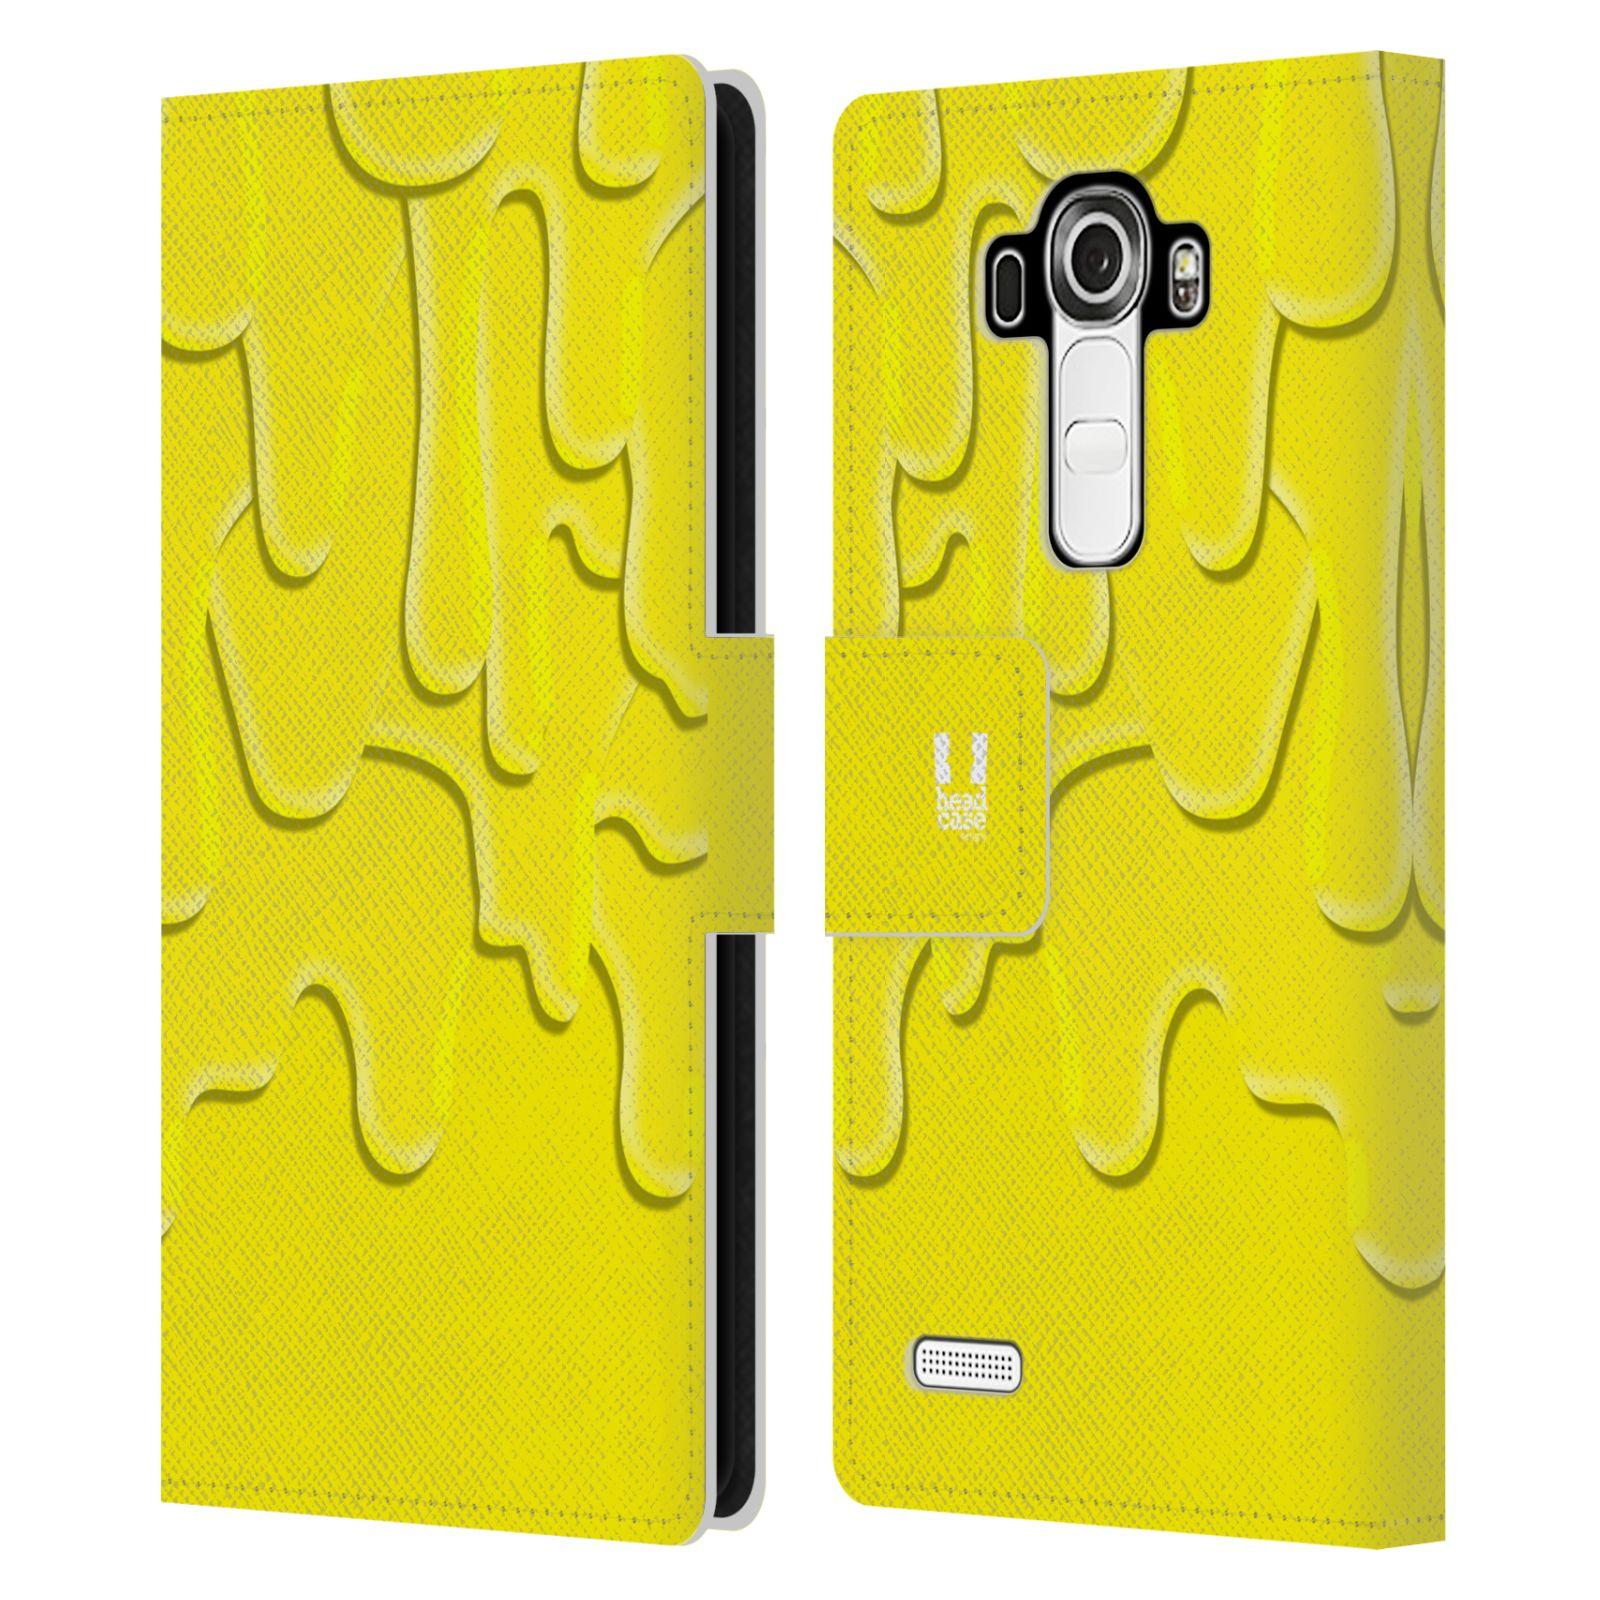 HEAD CASE Flipové pouzdro pro mobil LG G4 (H815) ZÁPLAVA BARVA žlutá